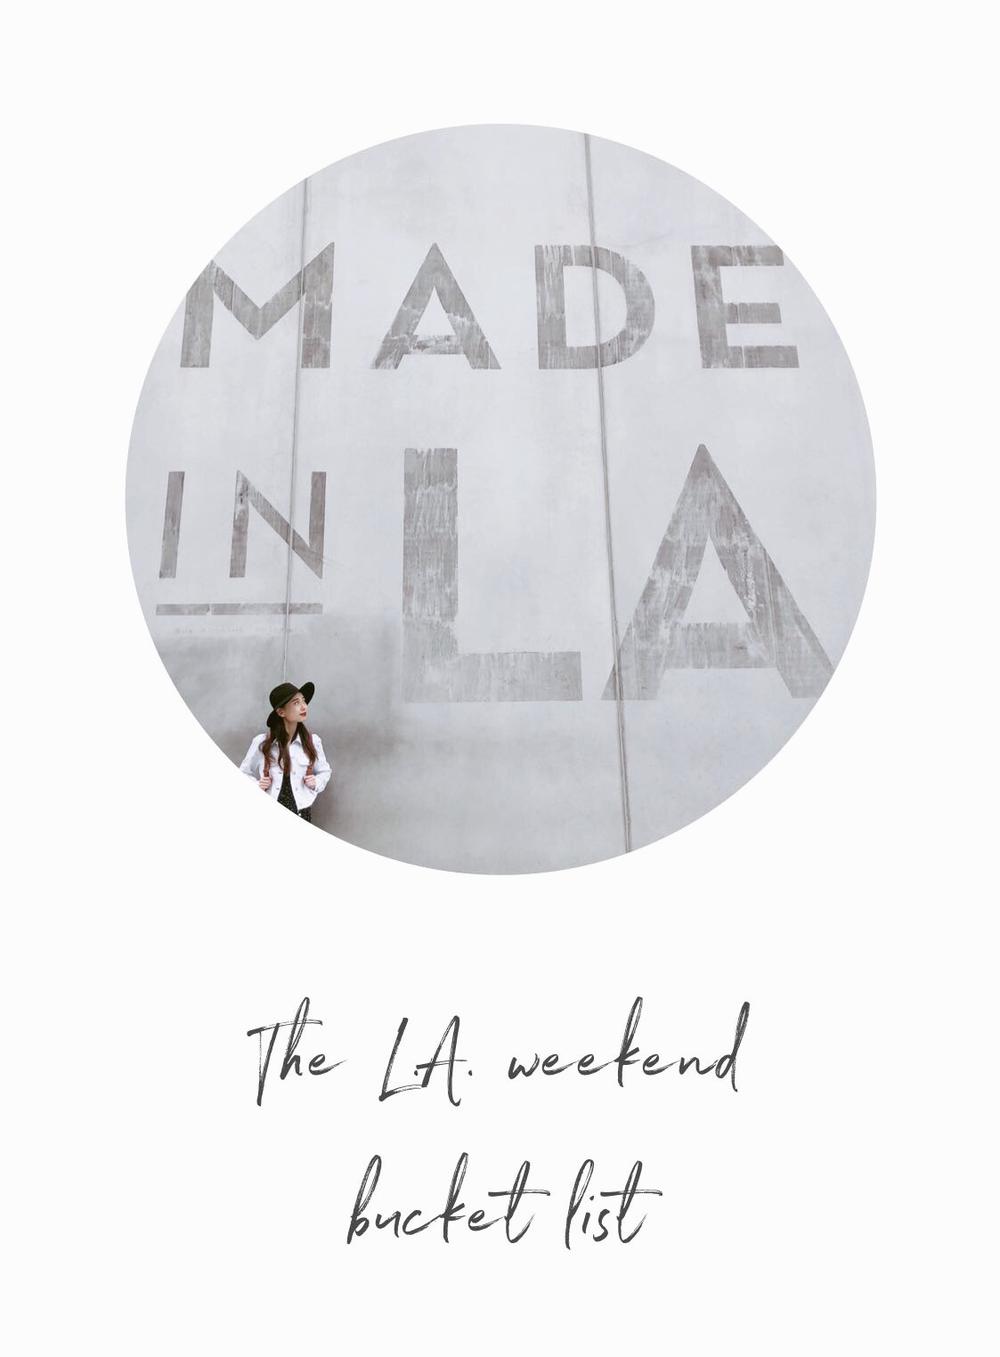 The L.A. Weekend Bucket List